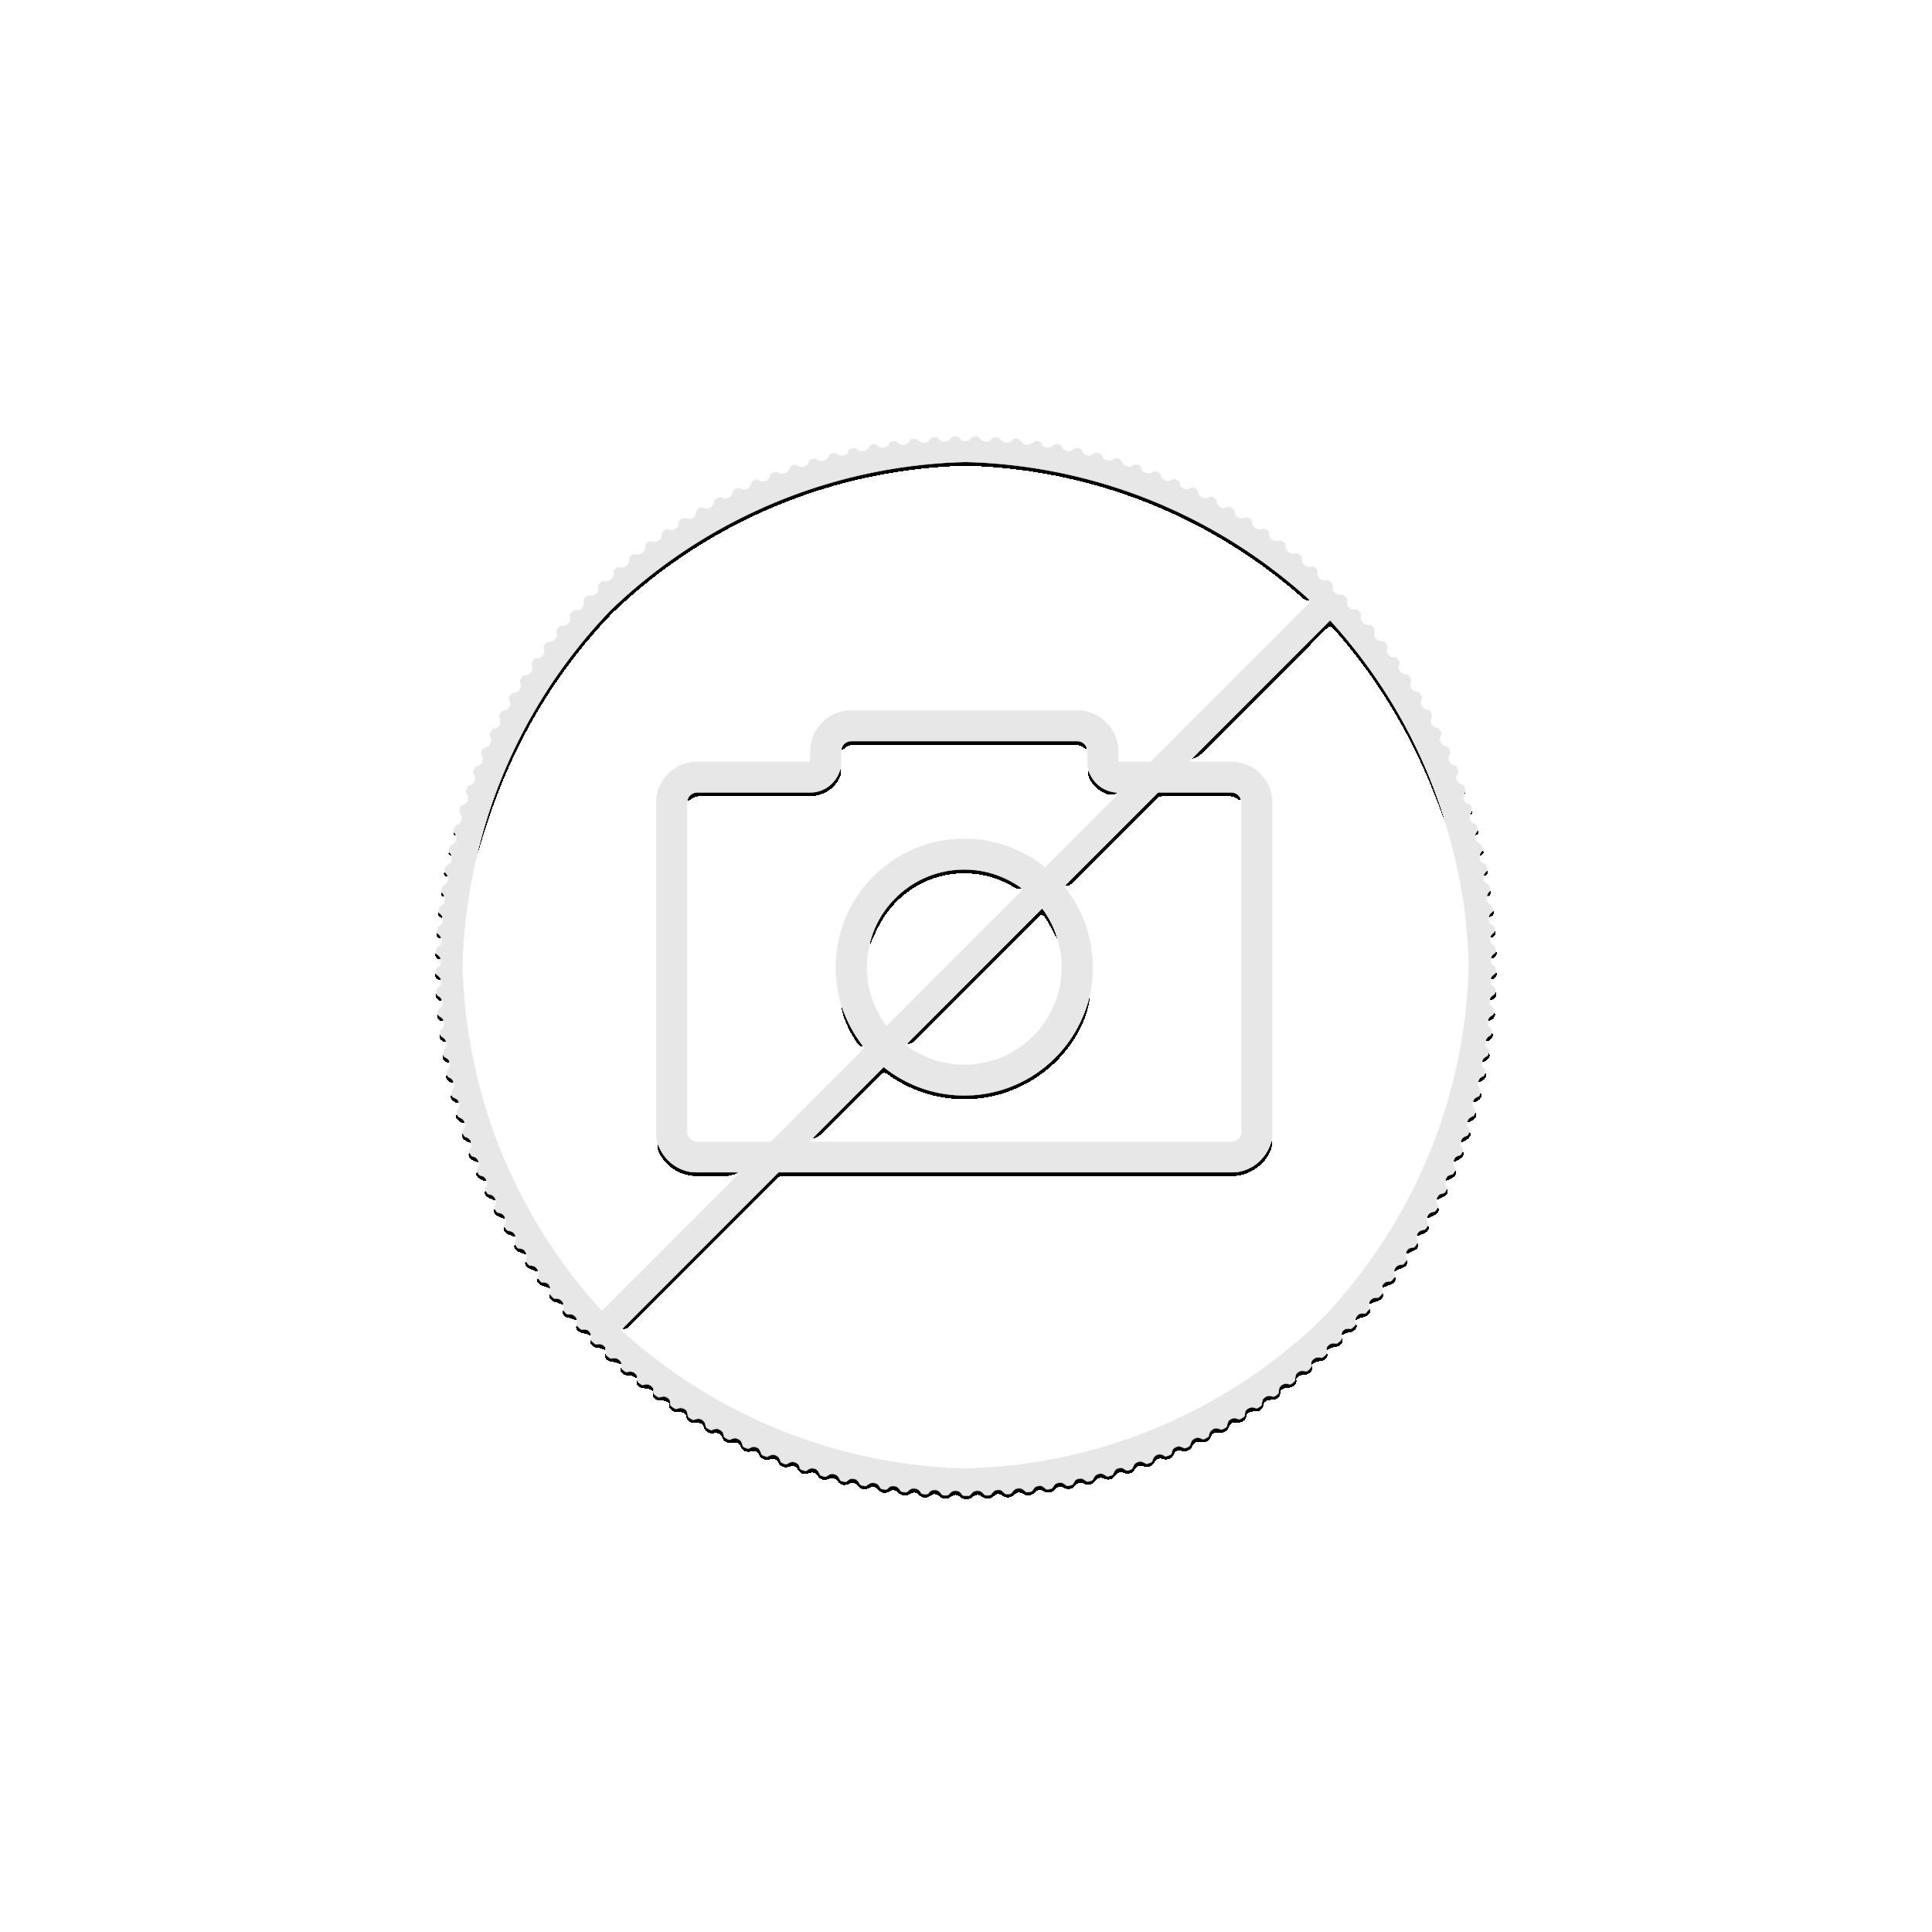 100 silver 50 guilder coins